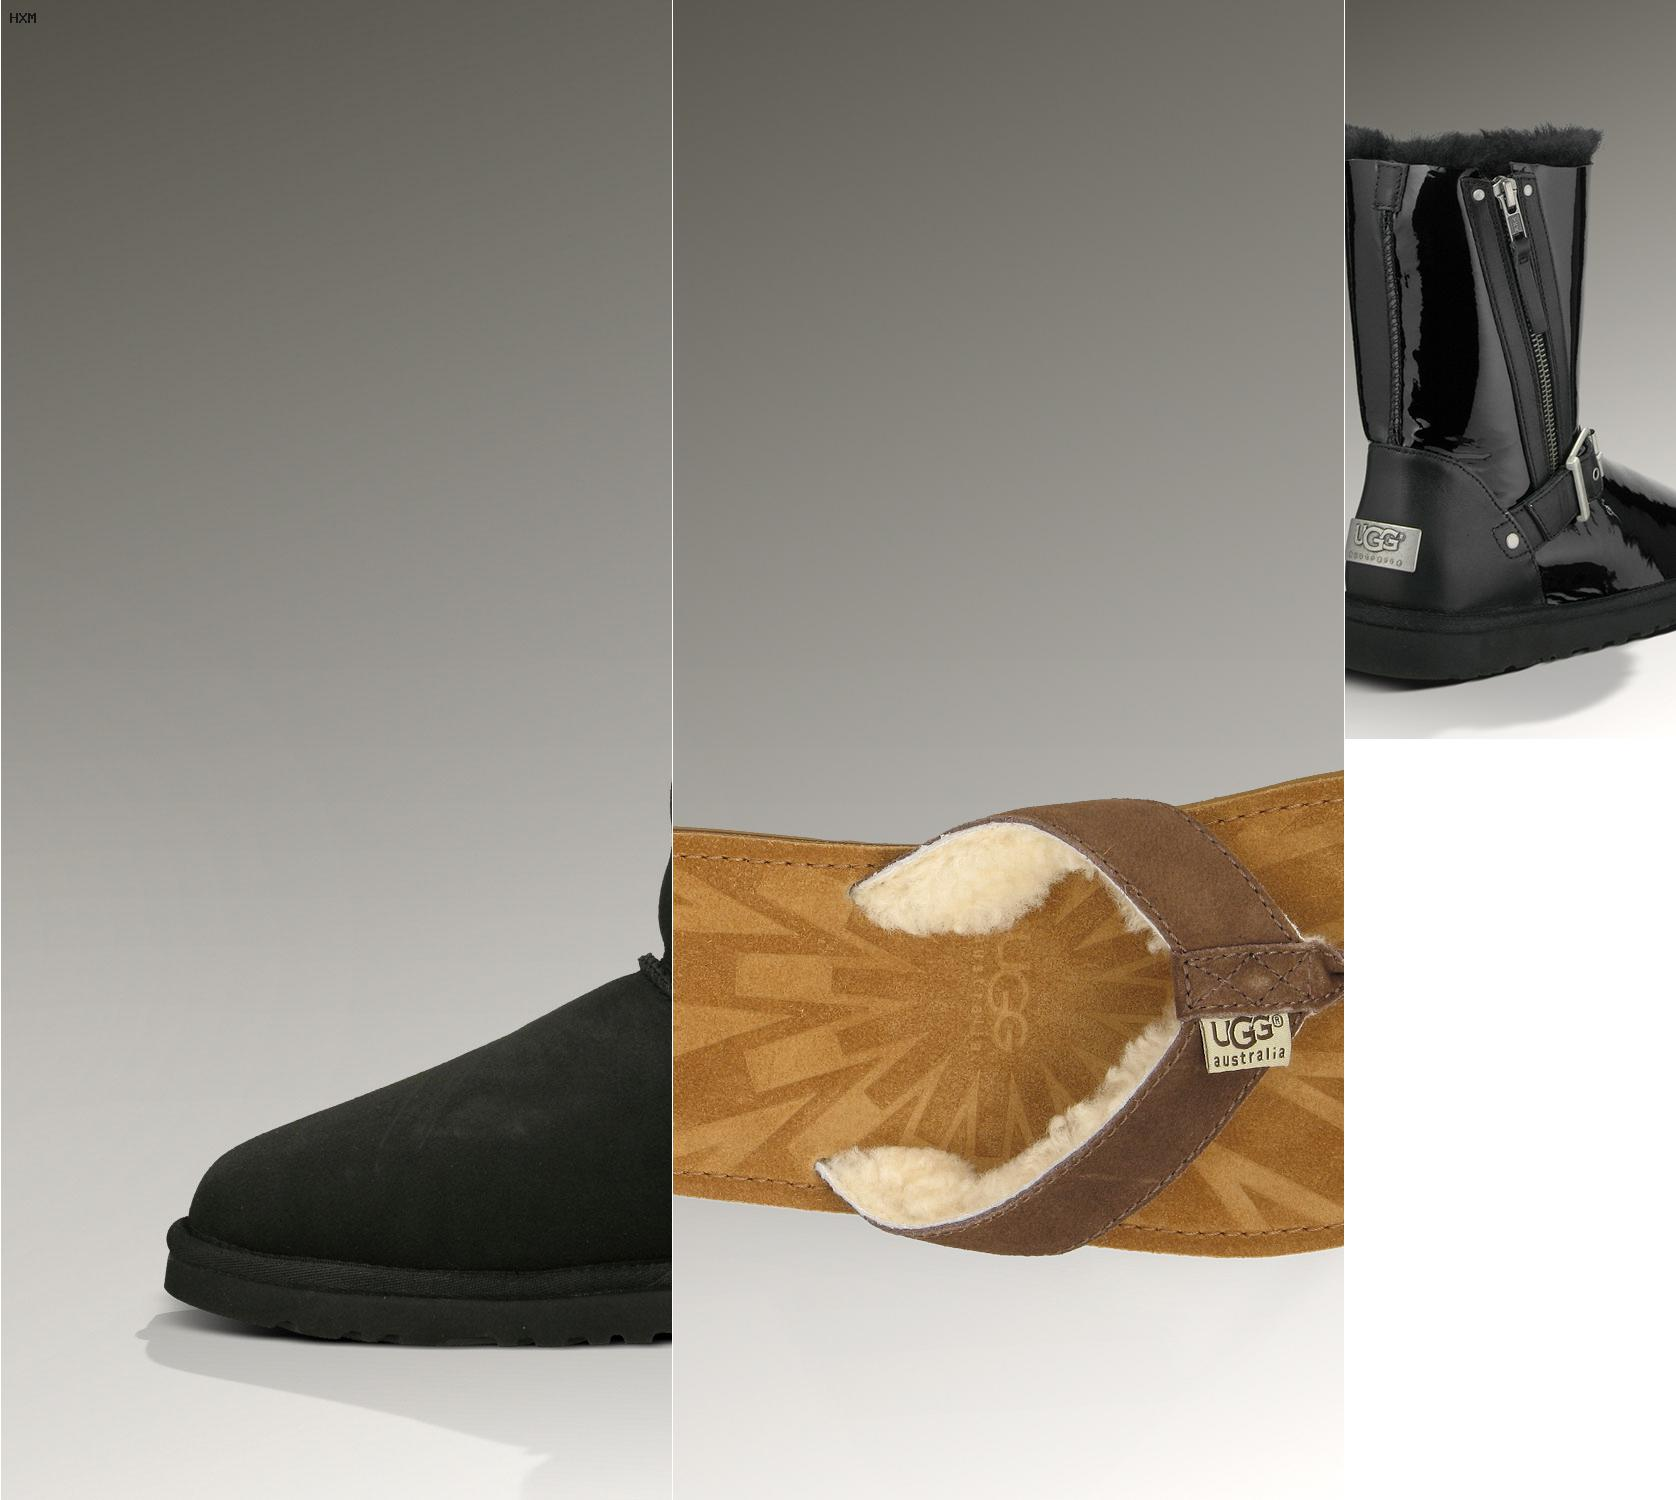 calzature ugg italia